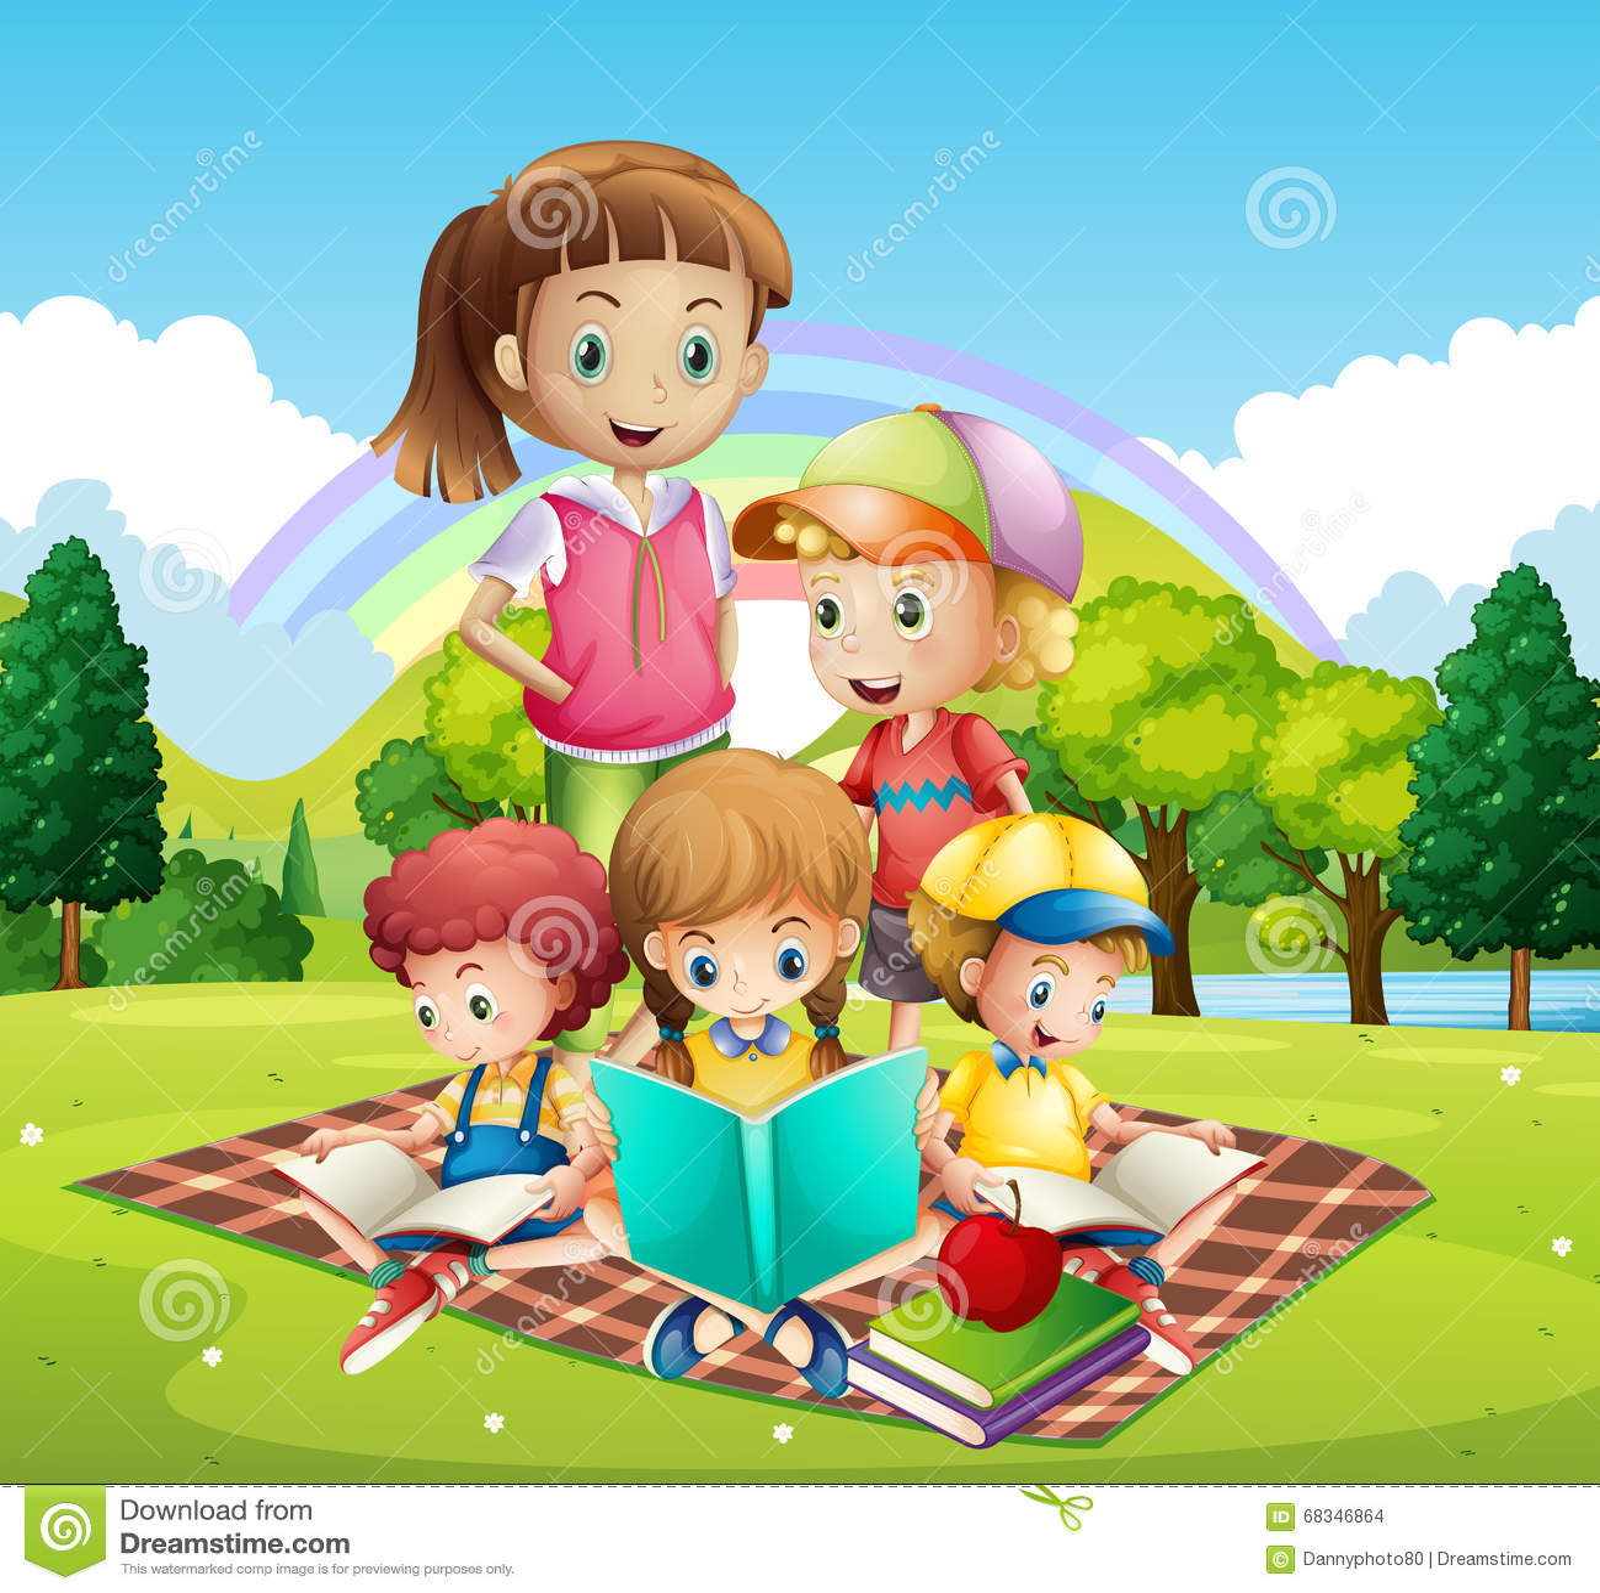 Children Reading Books In The Park Stock Vector - Image: 68346864